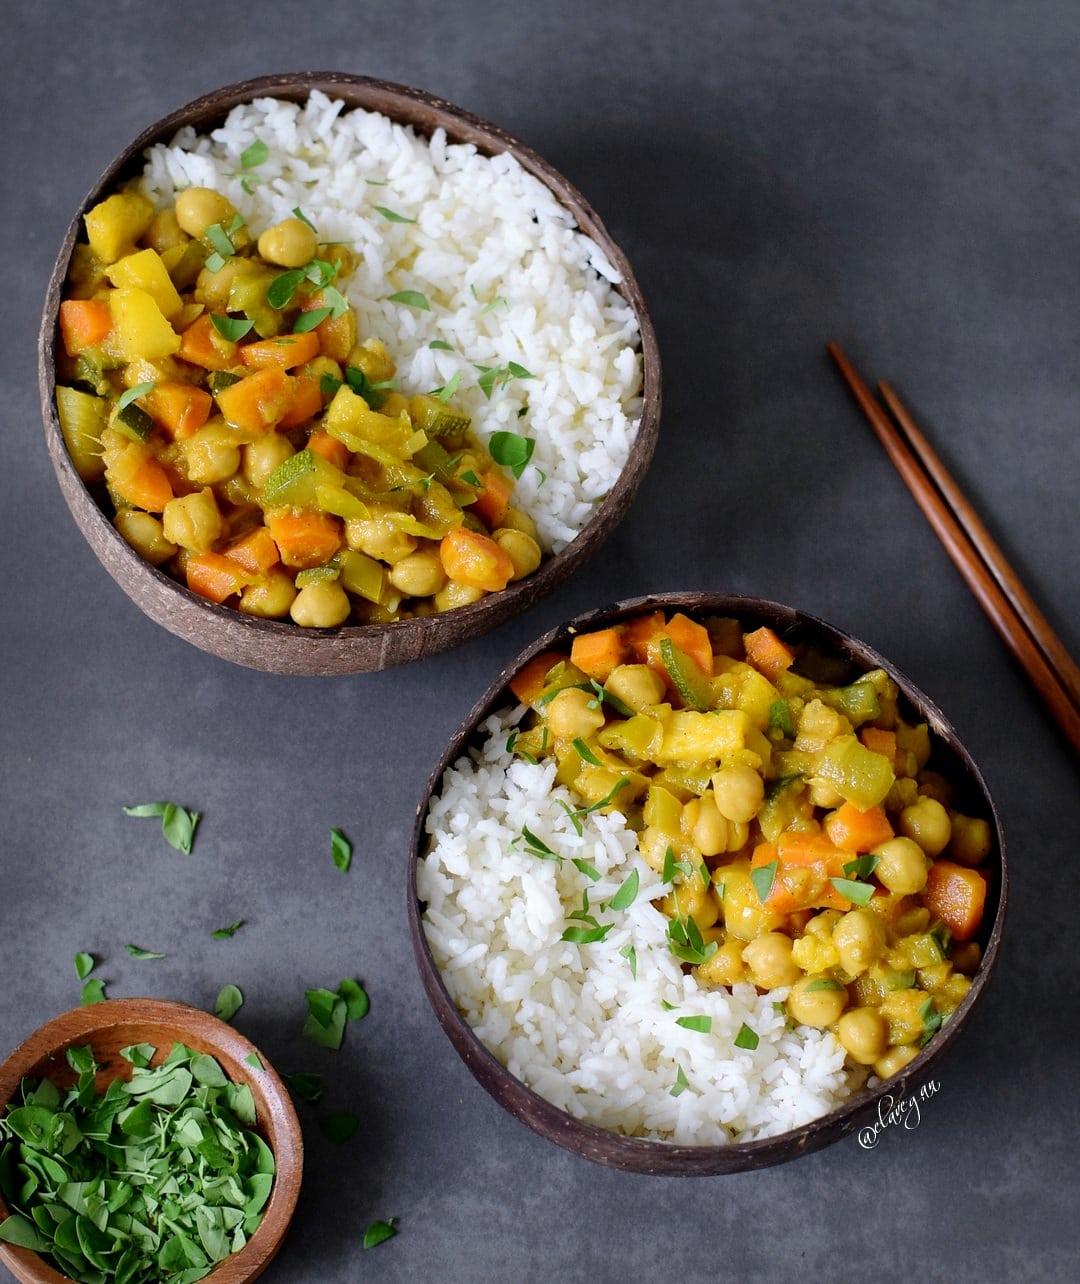 gem se curry rezept mit ananas vegan glutenfrei elavegan german. Black Bedroom Furniture Sets. Home Design Ideas